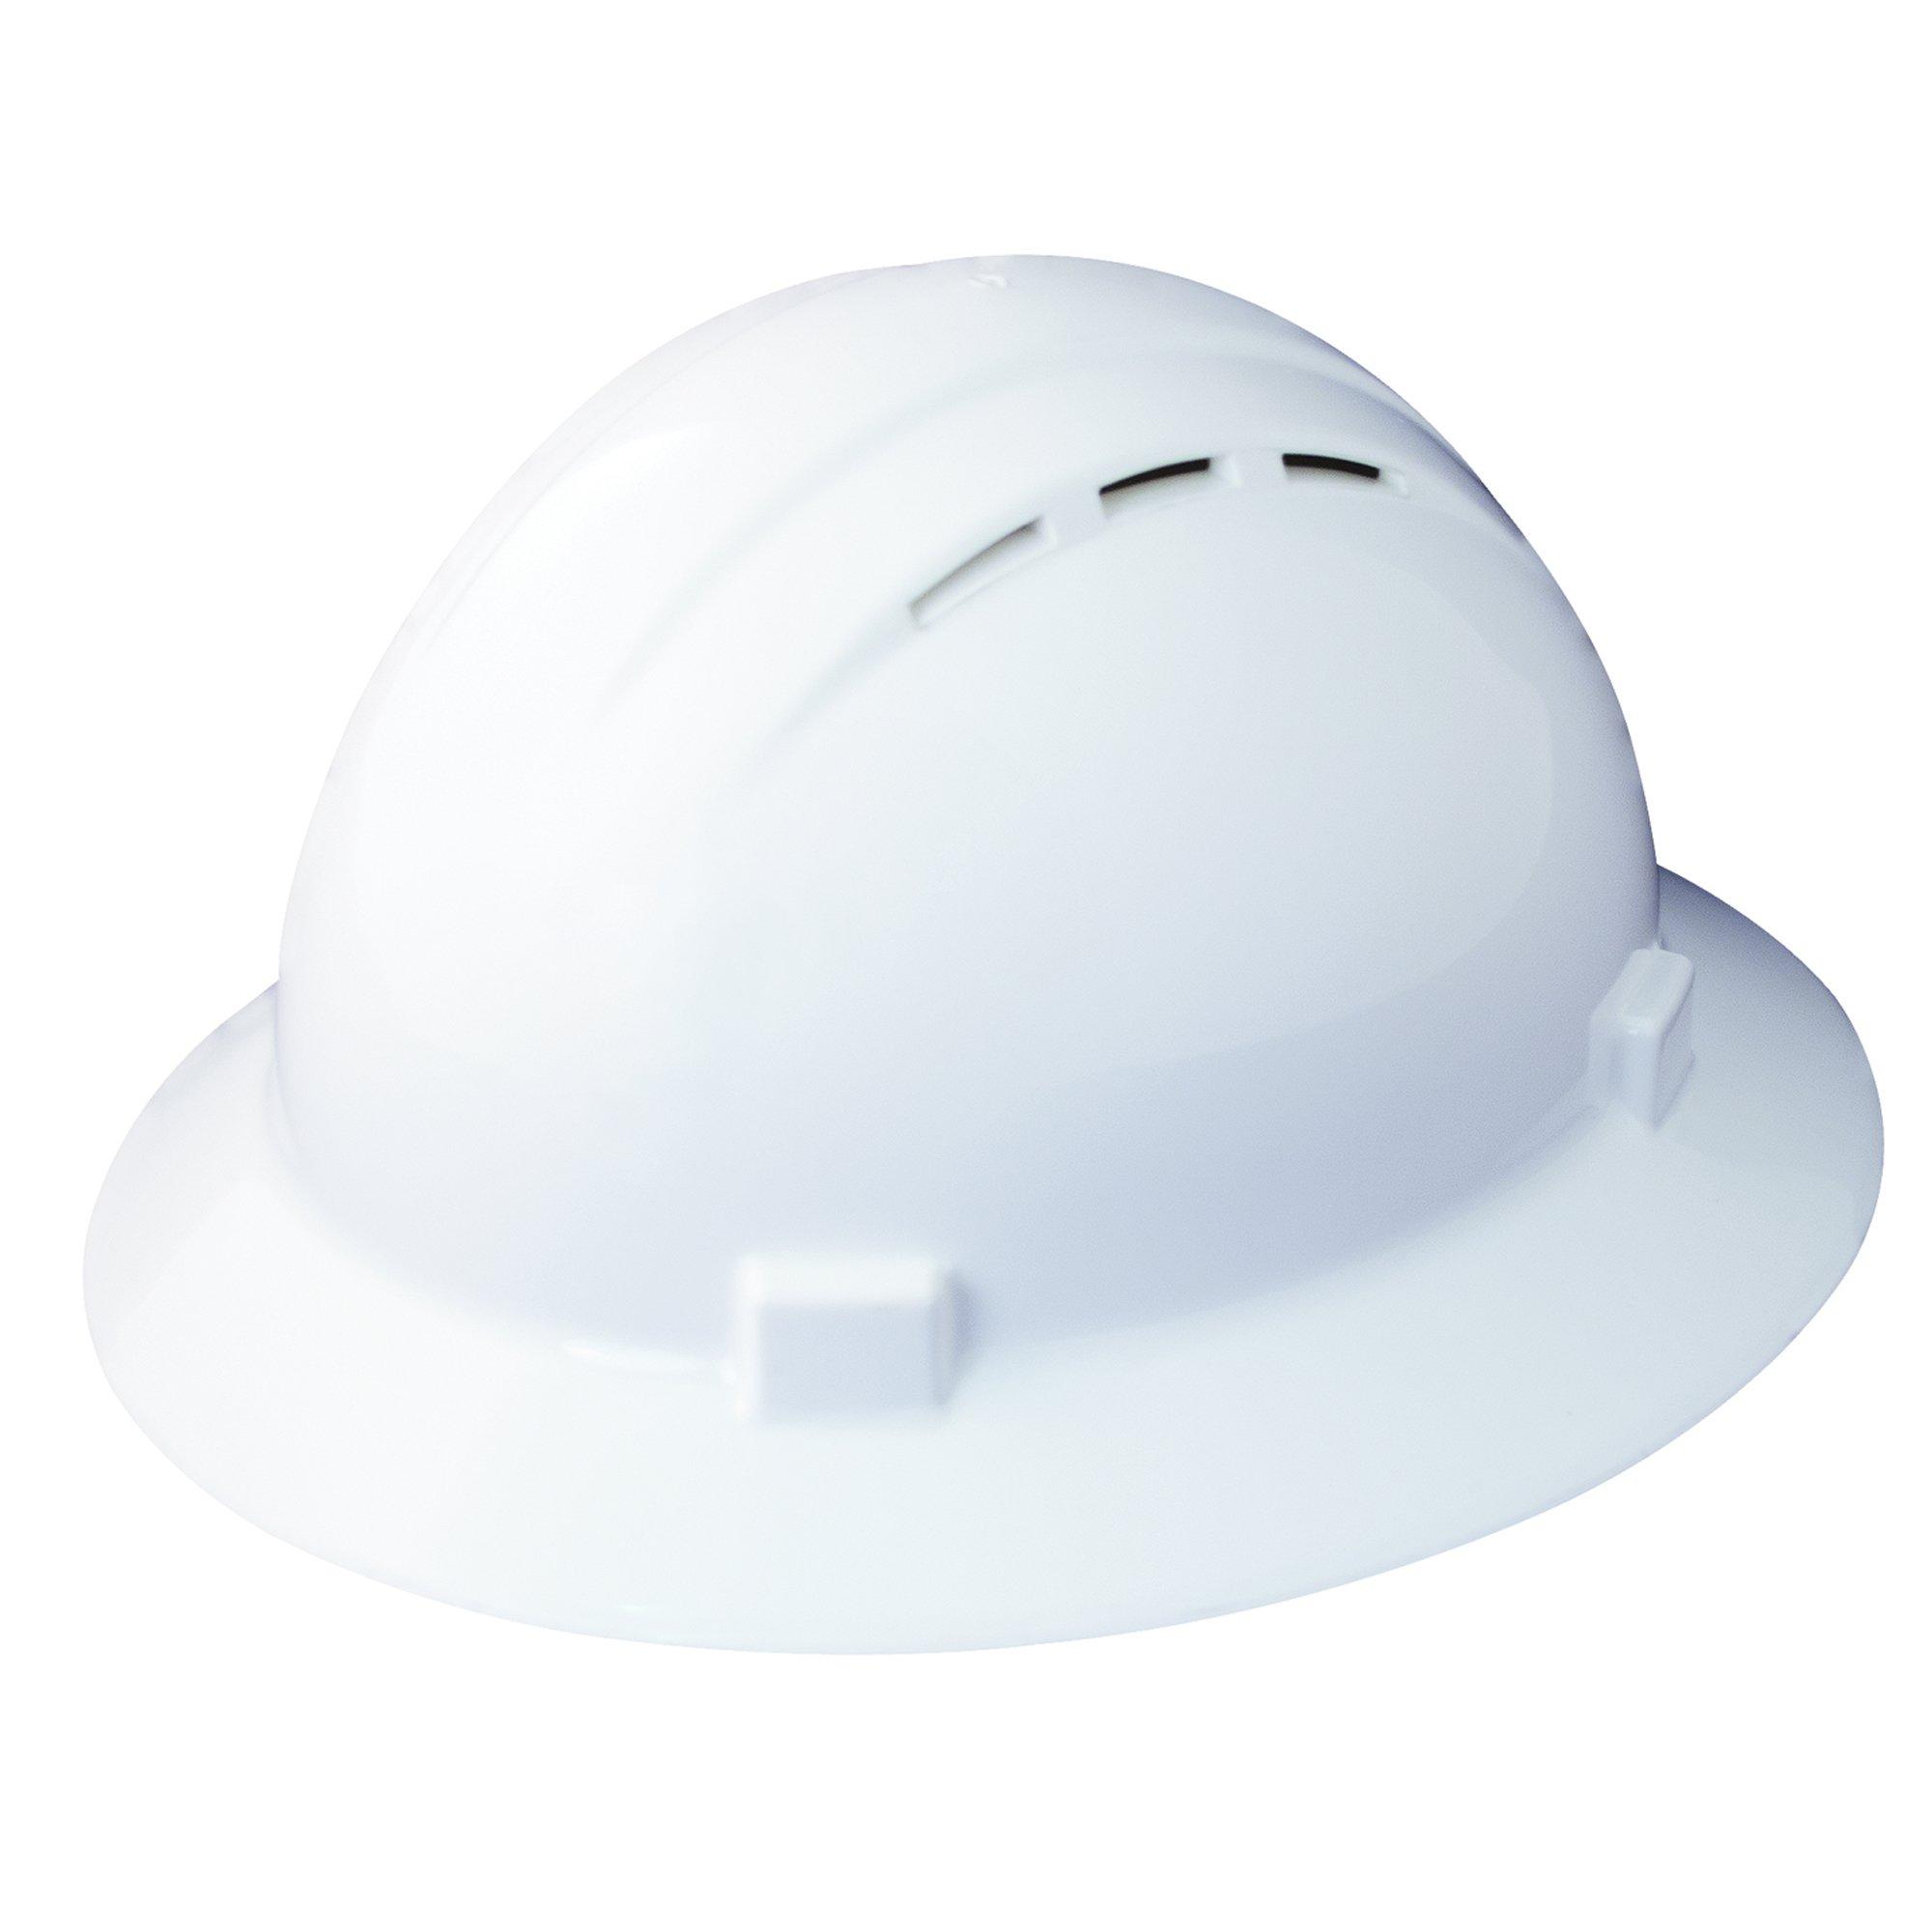 ERB Safety Products 19431 Americana Full Brim Vent Mega Ratchet, Size: 6 1/2 - 8, White